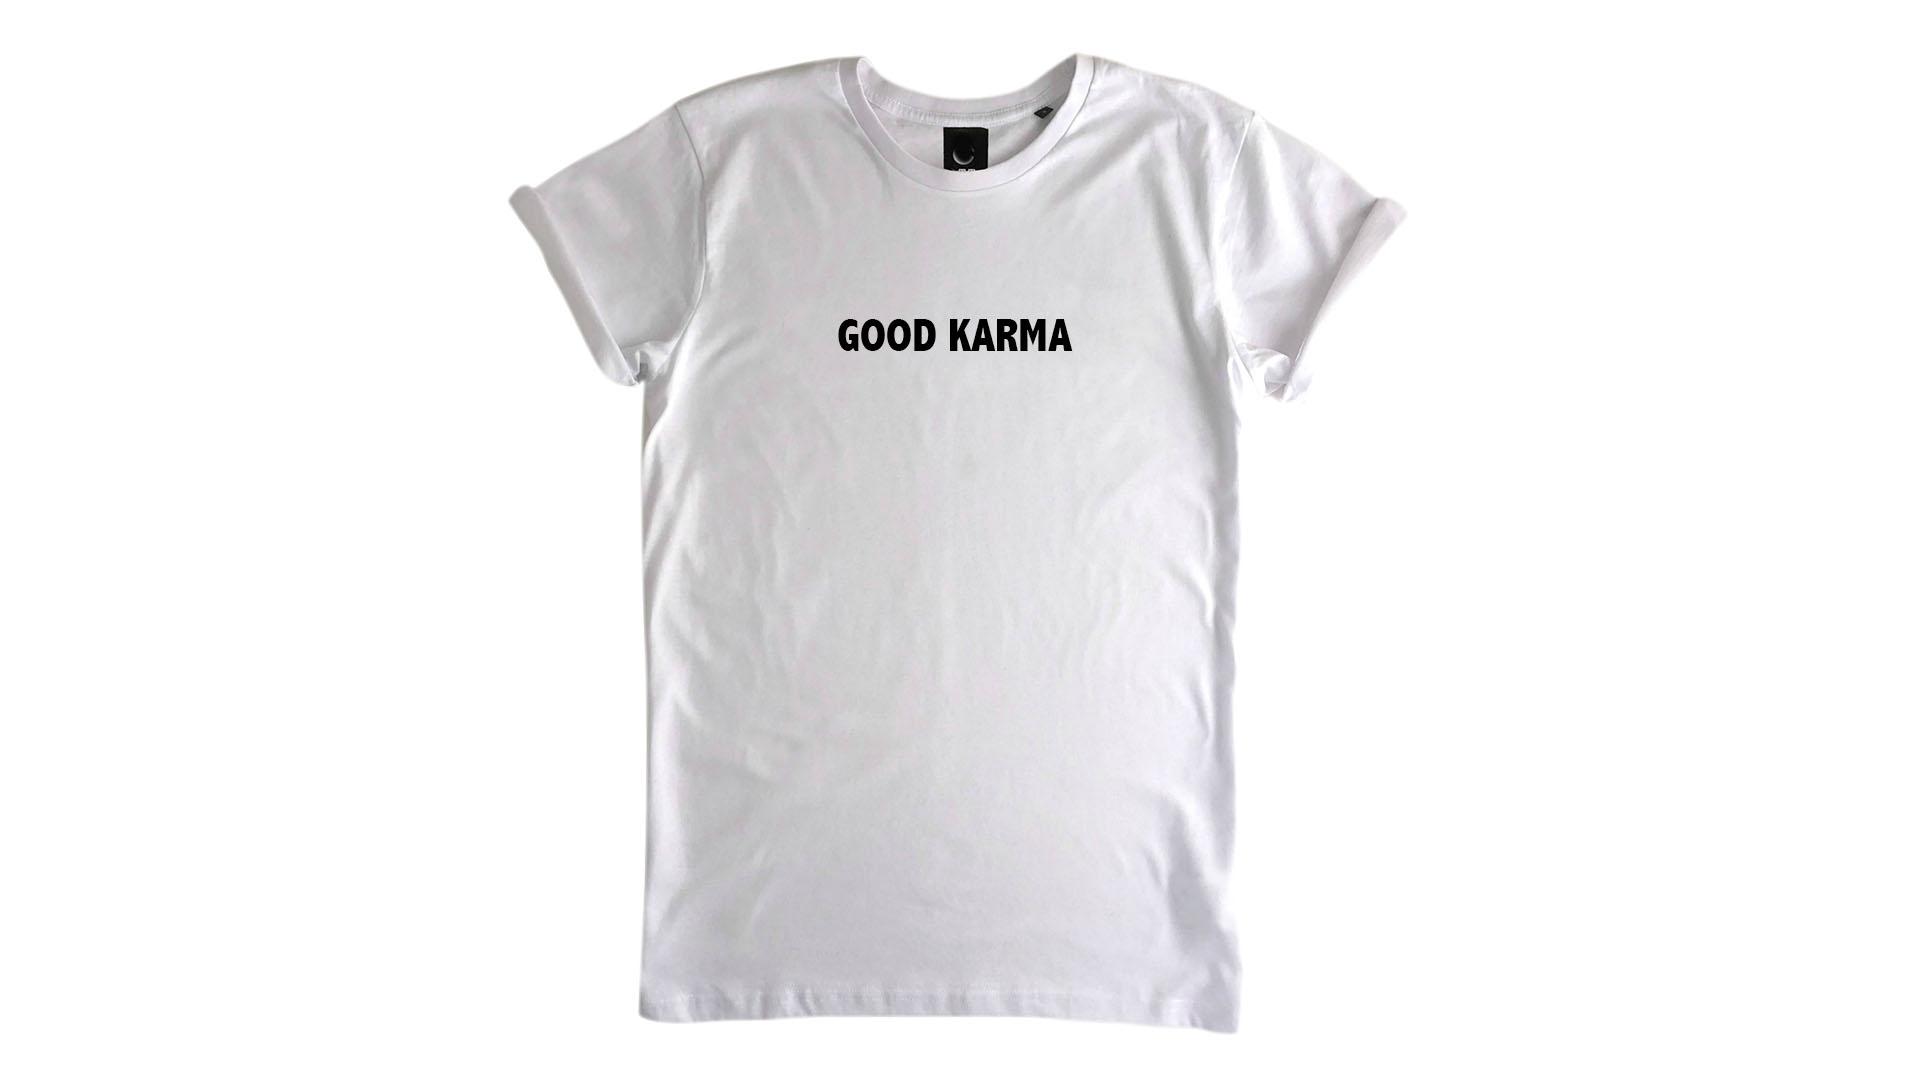 LiveLearn.Yoga Yoga T-Shirt Organic Cotton Good Karma White